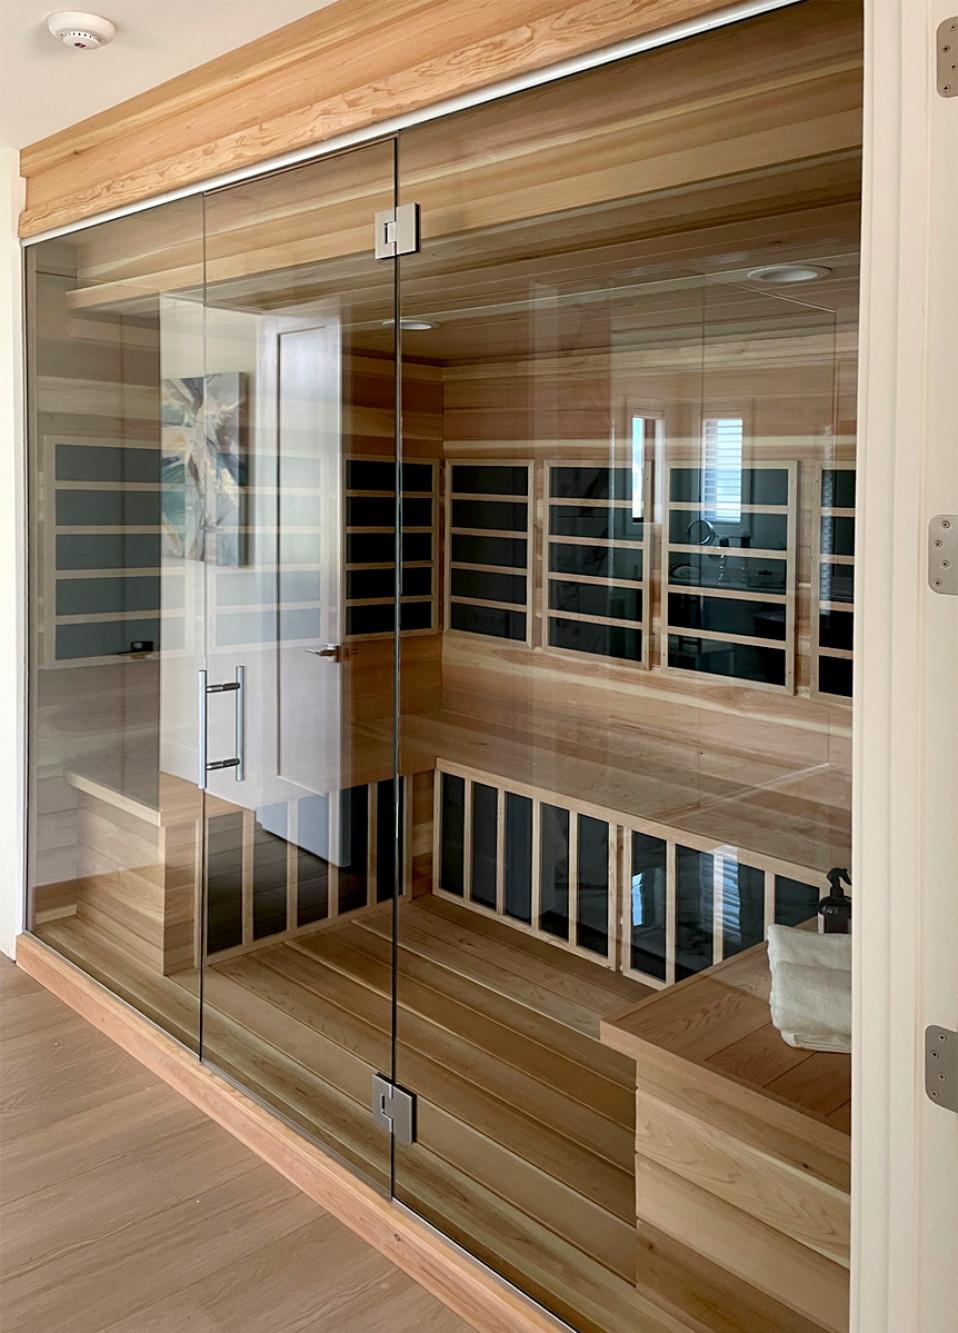 custom glass for sauna (Parade of homes, Waunakee)